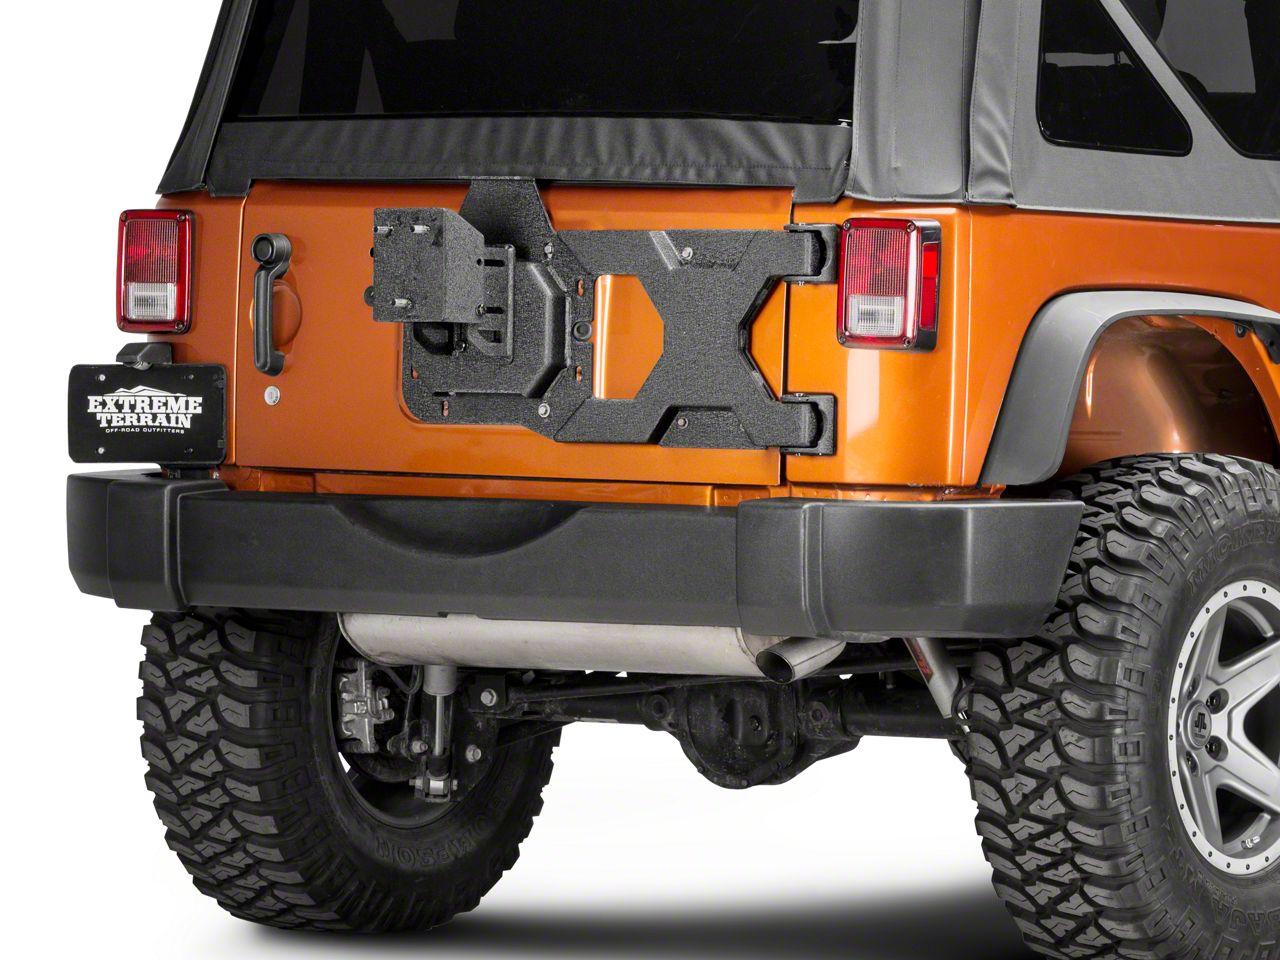 Captivating Barricade Jeep Wrangler HD Tire Carrier W/ Mount J106892 (07 18 Jeep  Wrangler JK)   Free Shipping